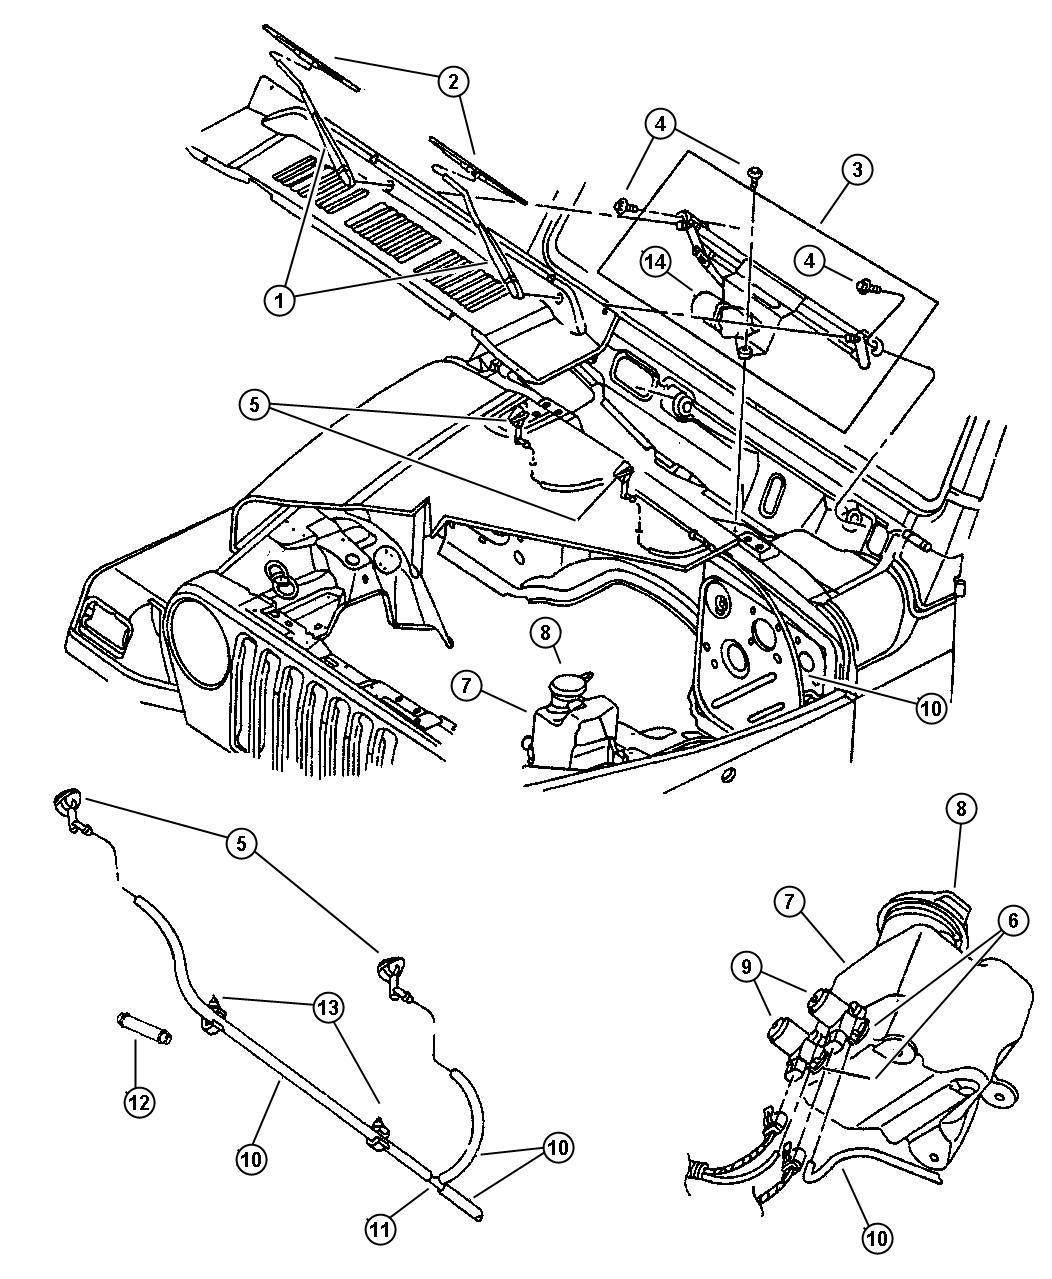 Jeep Wrangler Wiper System